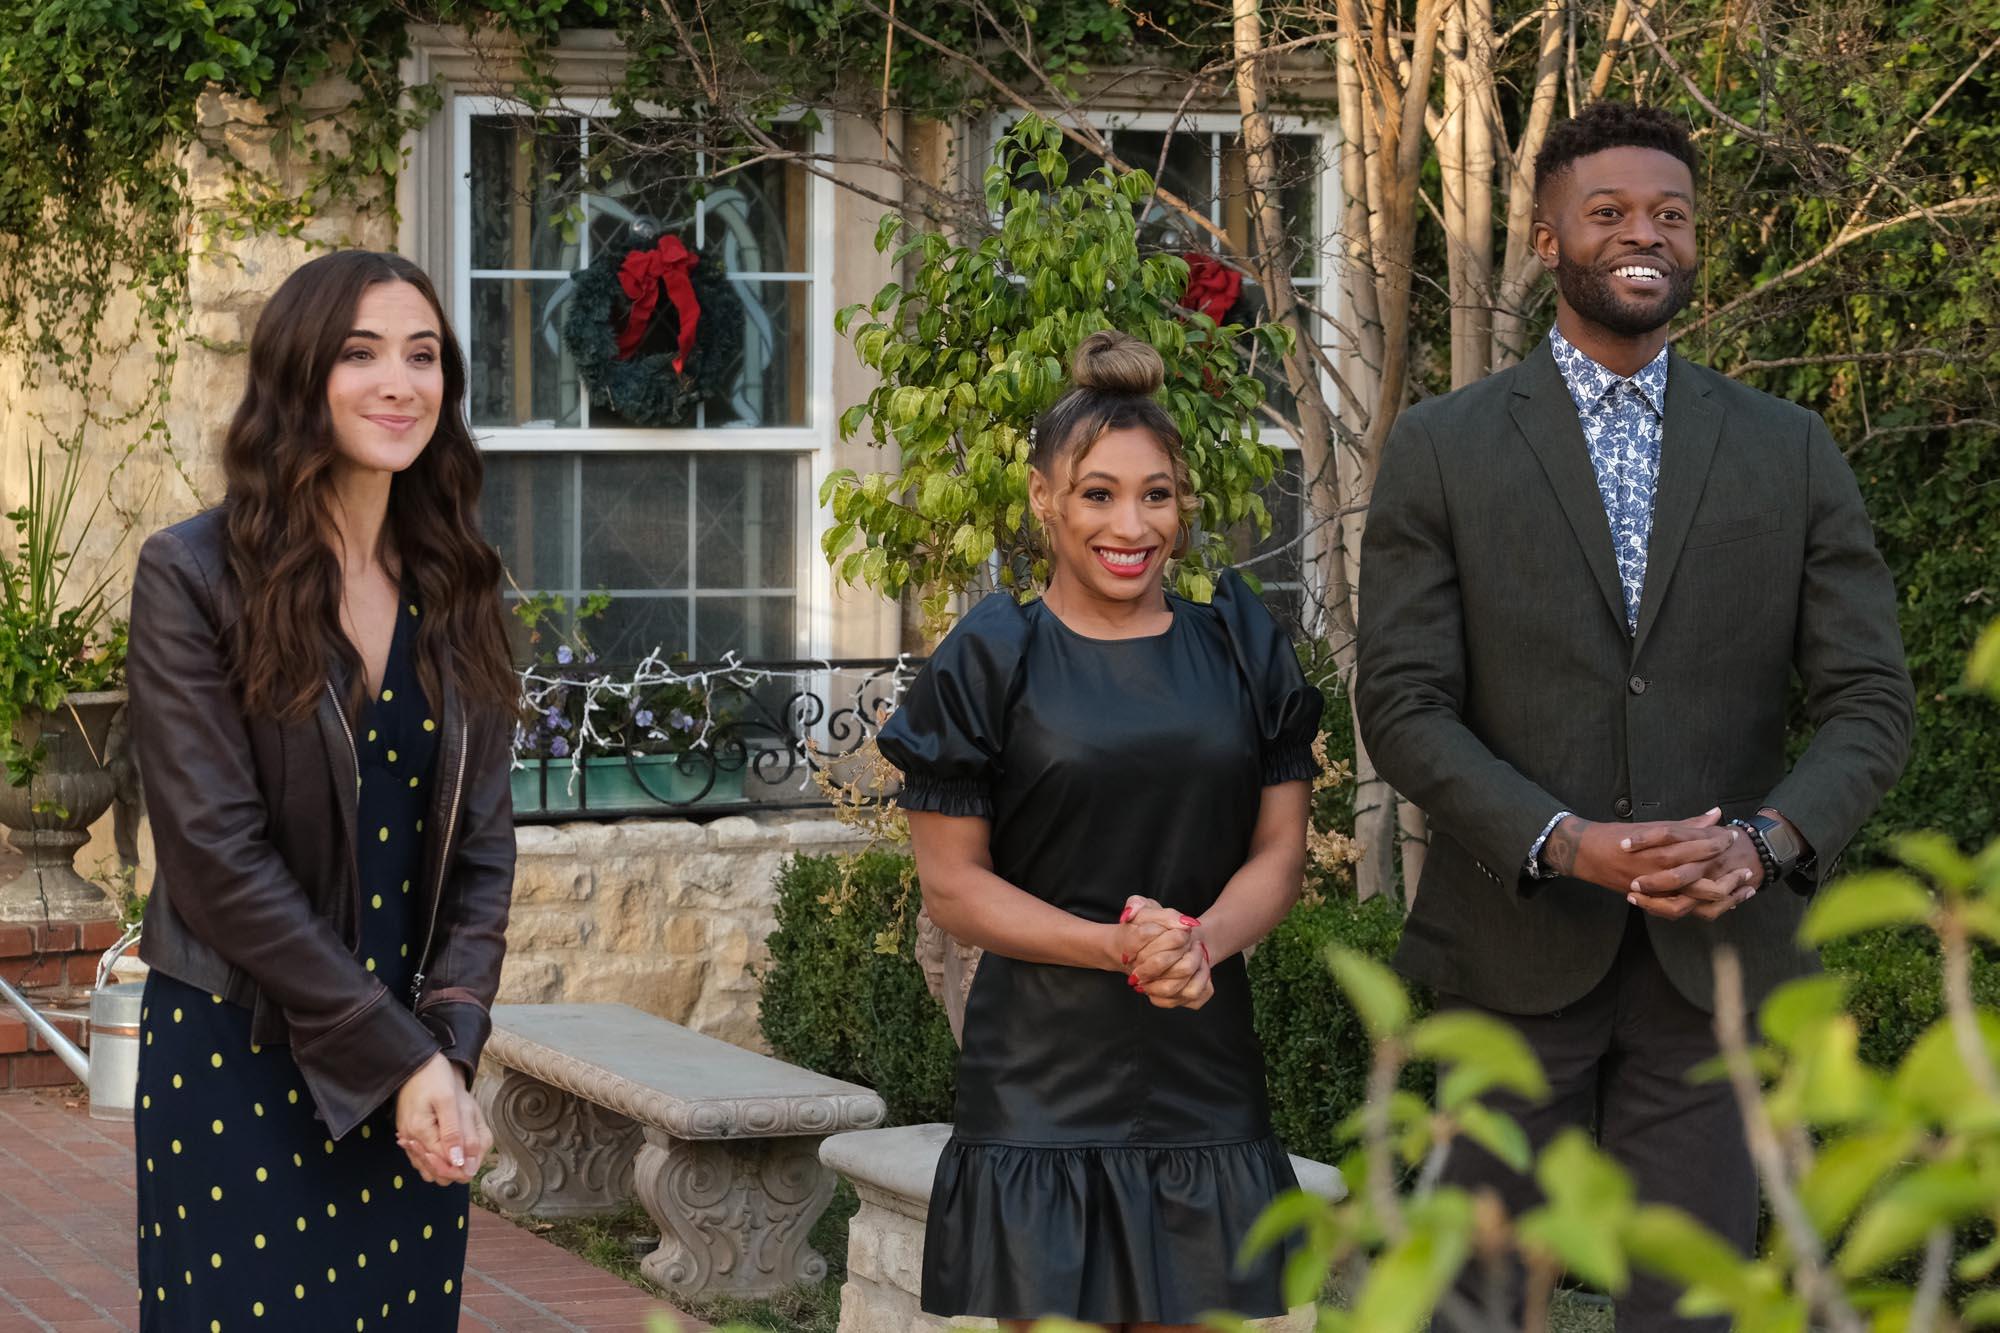 2021 Lifetime Christmas Movies - Welcome to the Christmas Family Reunion